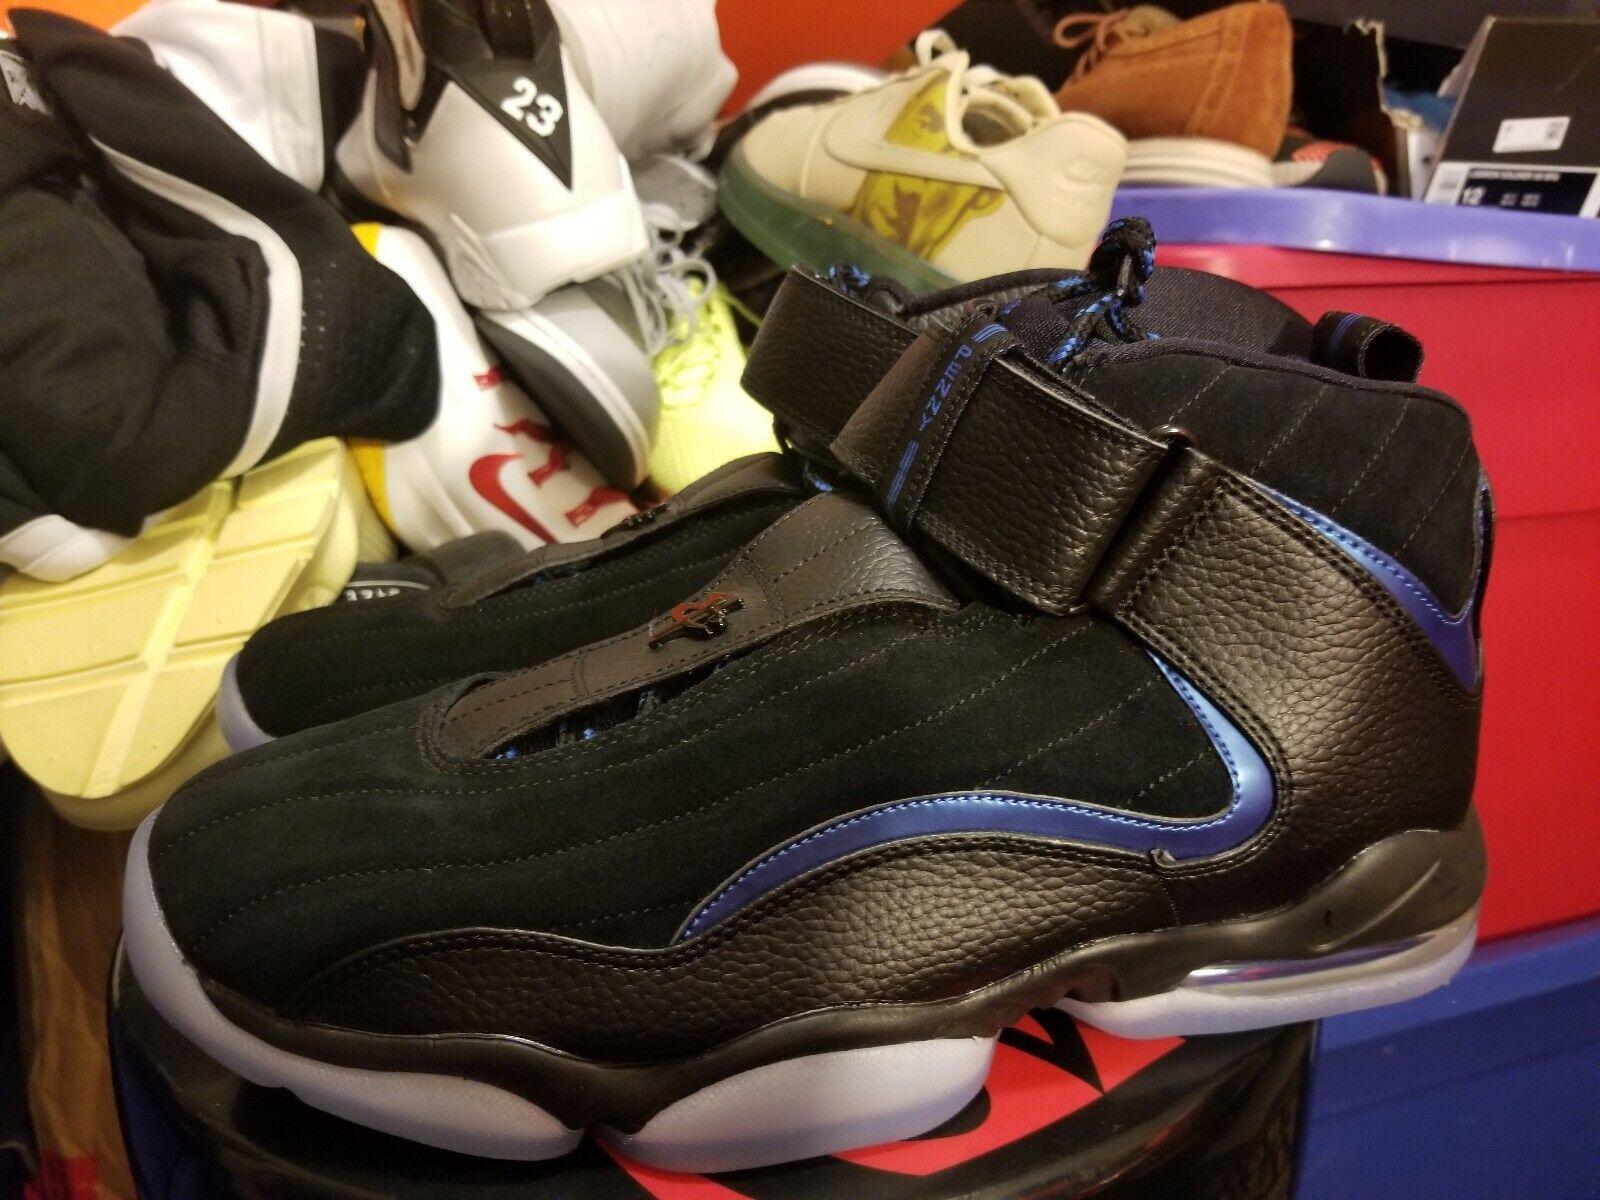 Nike Air Penny IV 4 Sz. 11.5 penny Hardaway Black bluee orlando Magic 864018-001